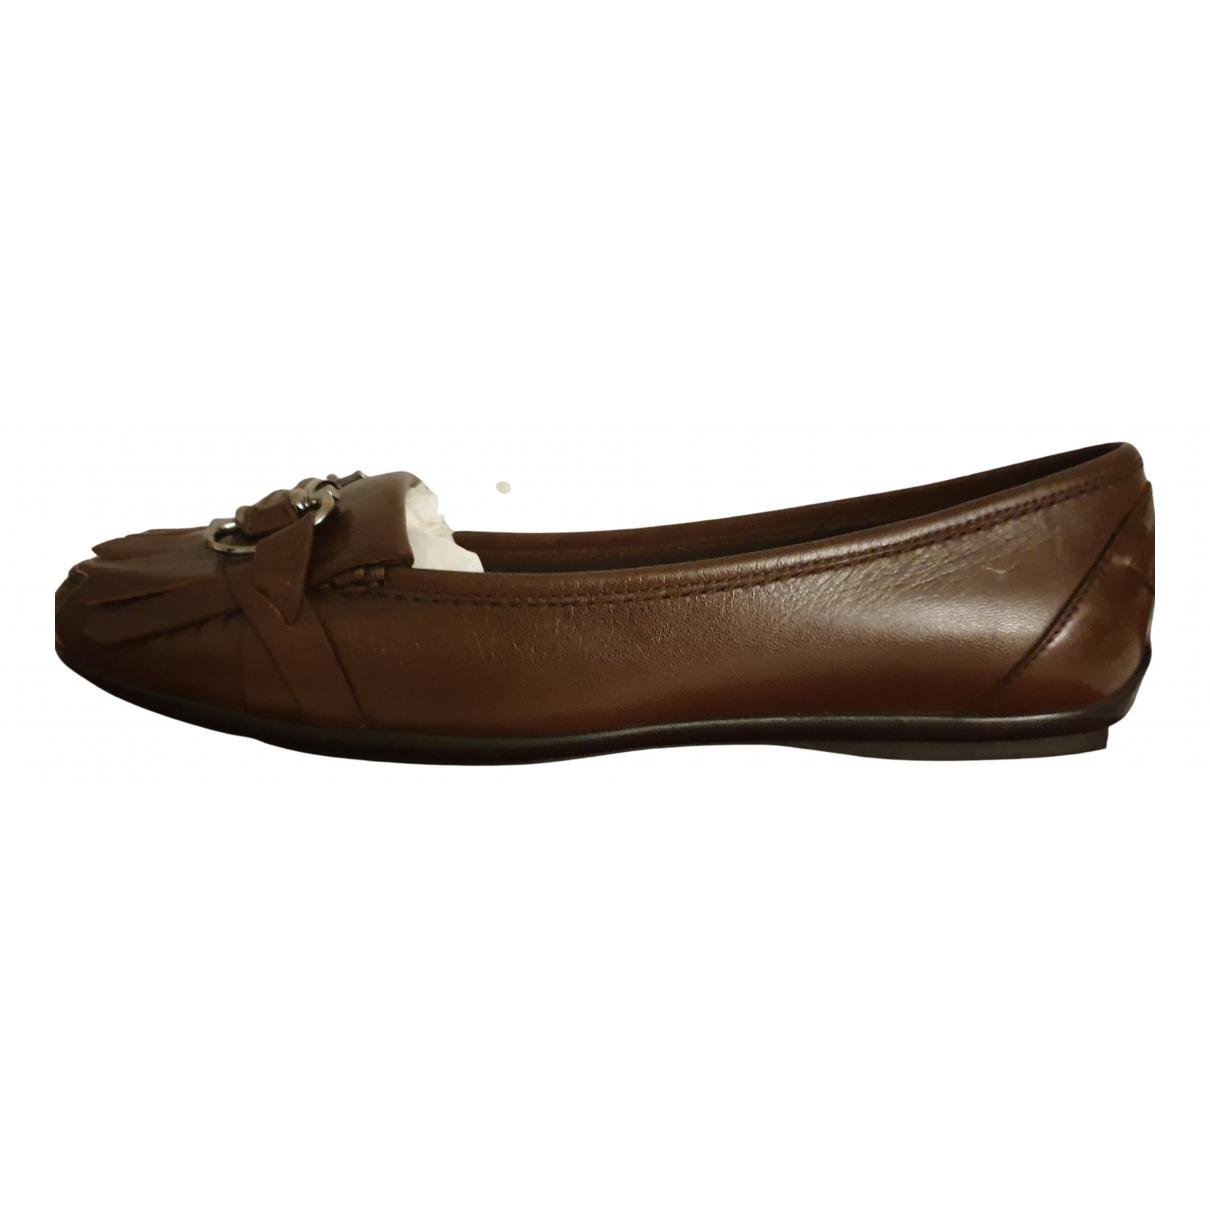 Salvatore Ferragamo N Brown Leather Flats for Women 10 US